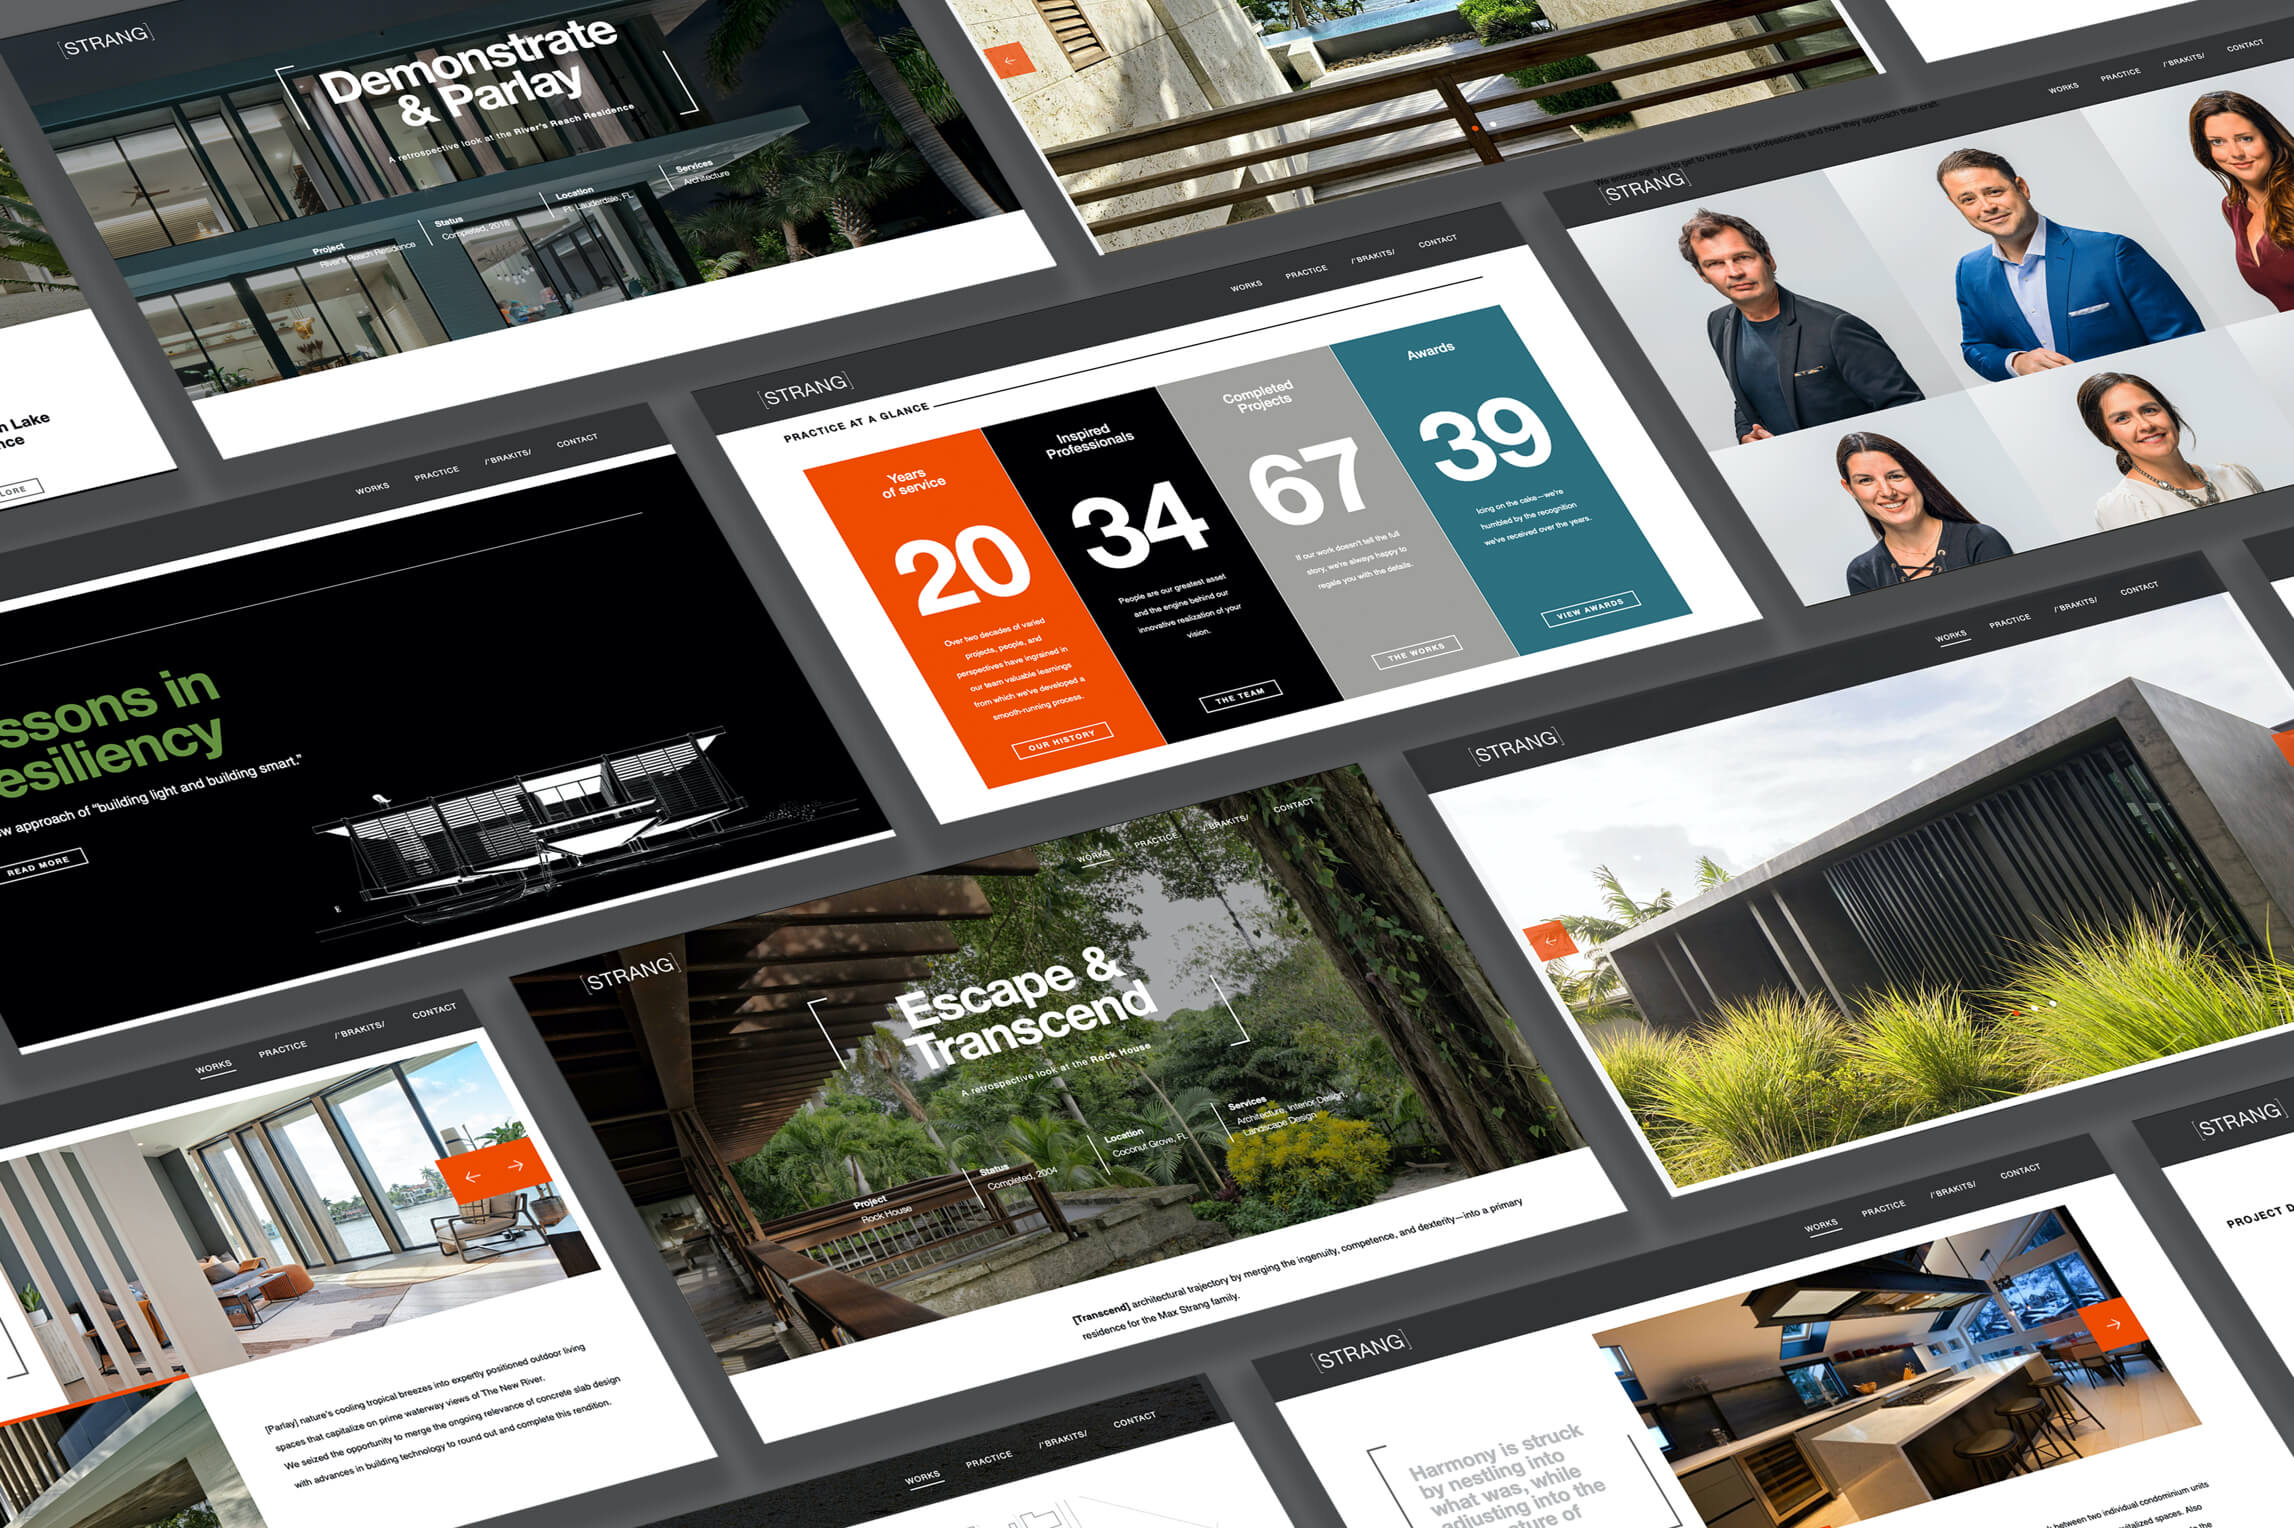 Strang Web Design